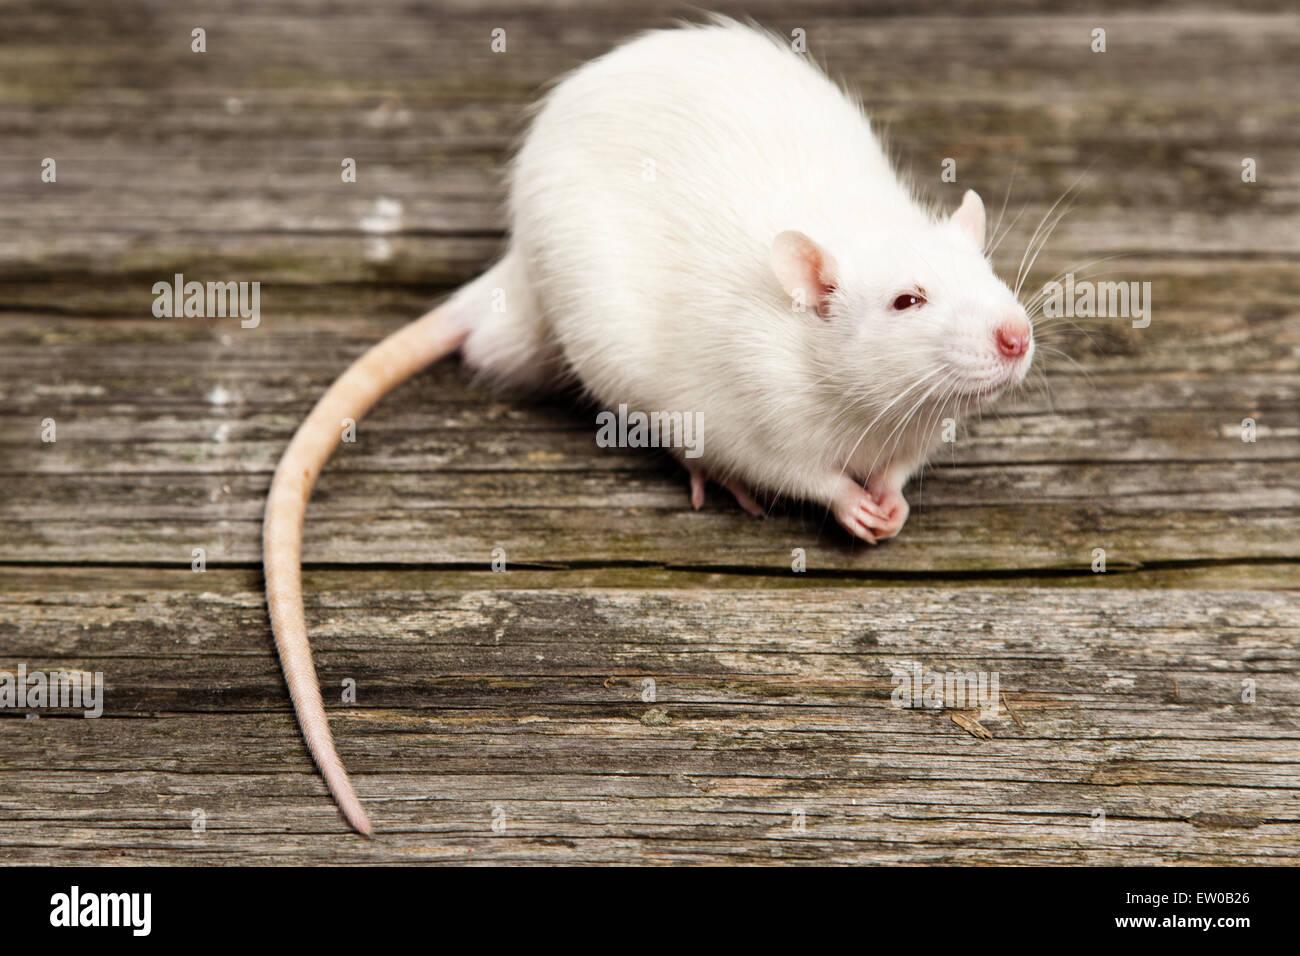 Haustier Ratte Stockfoto